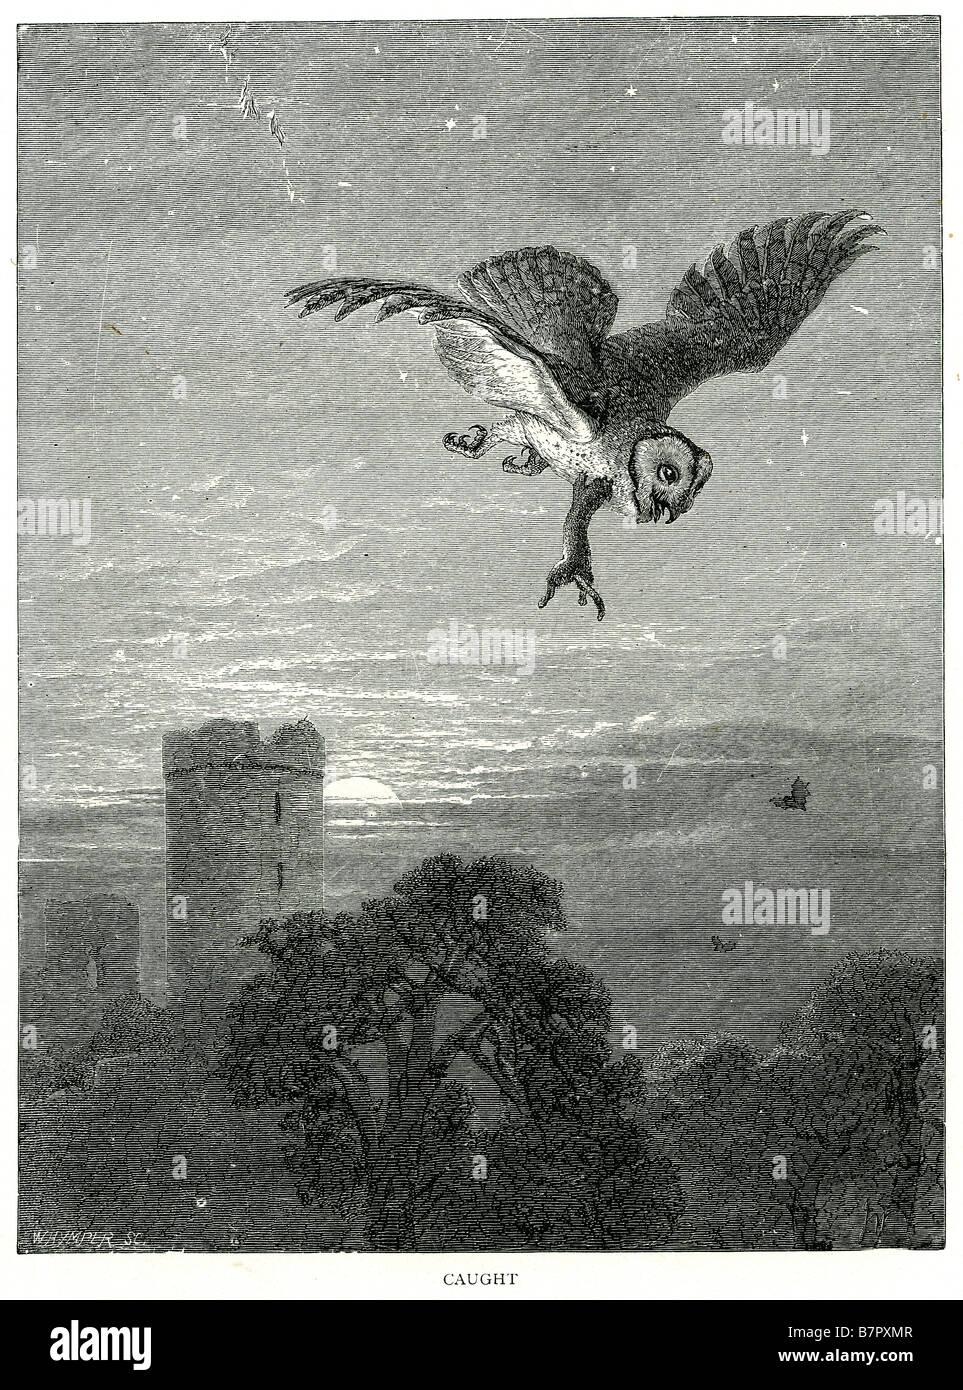 Eule Himmel Vogel fliegt Sonnenuntergang Sonnenaufgang Burg Bäume außerhalb Beute Hermelin Wiesel Dämmerung Stockbild